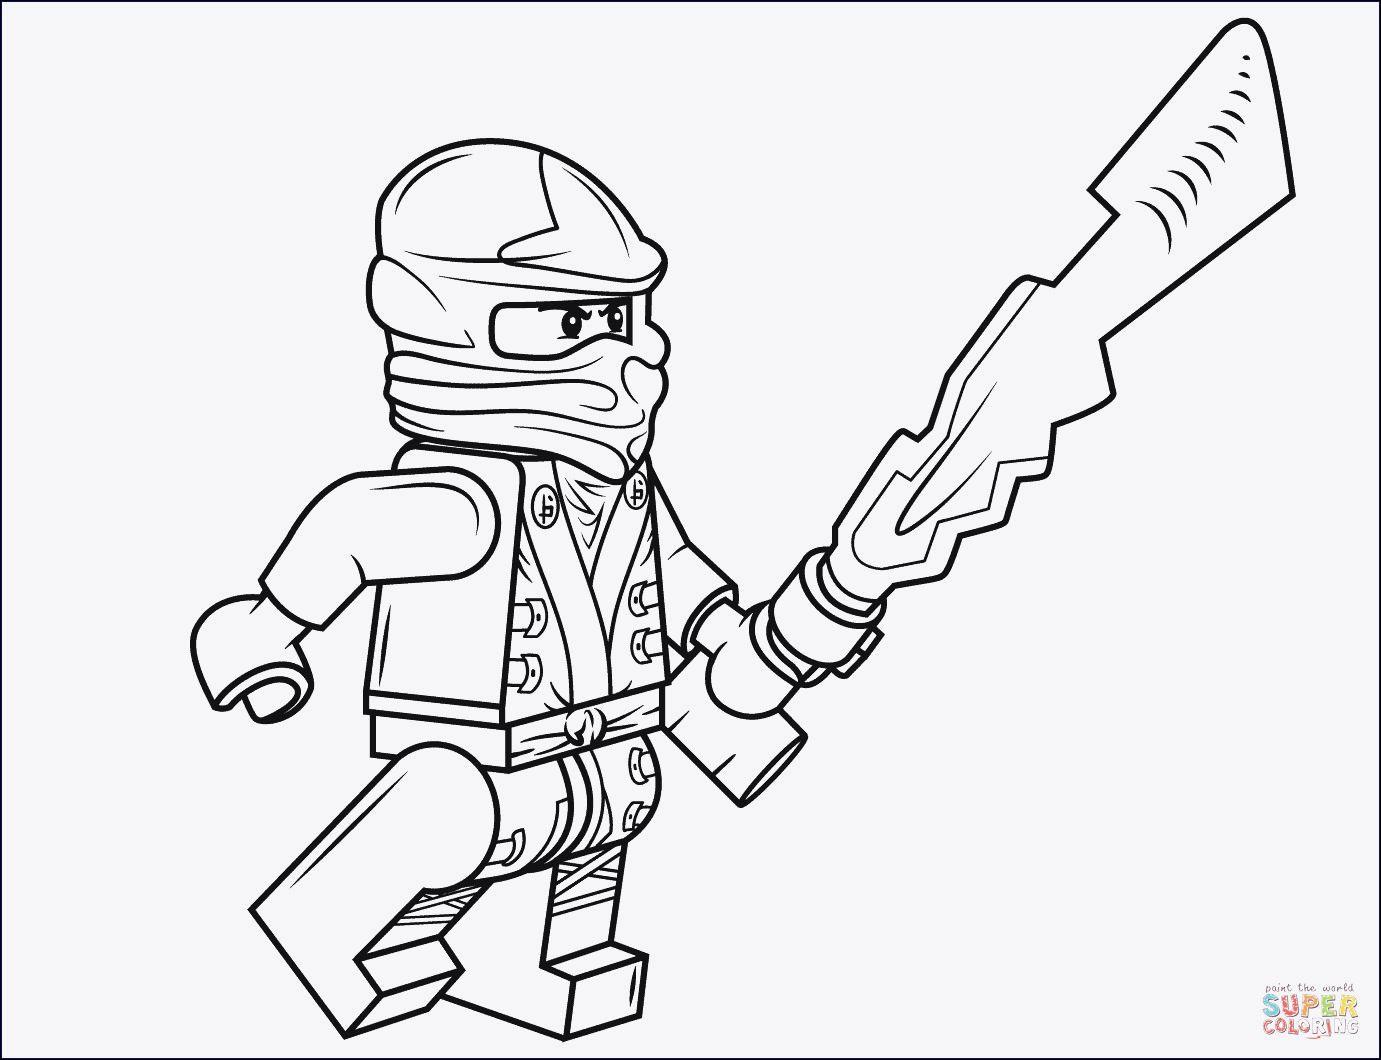 Ausmalbilder Ninjago Zum Ausdrucken Genial Ausmalbilder Ninjago Kostenlos Zum Ausdrucken Stock